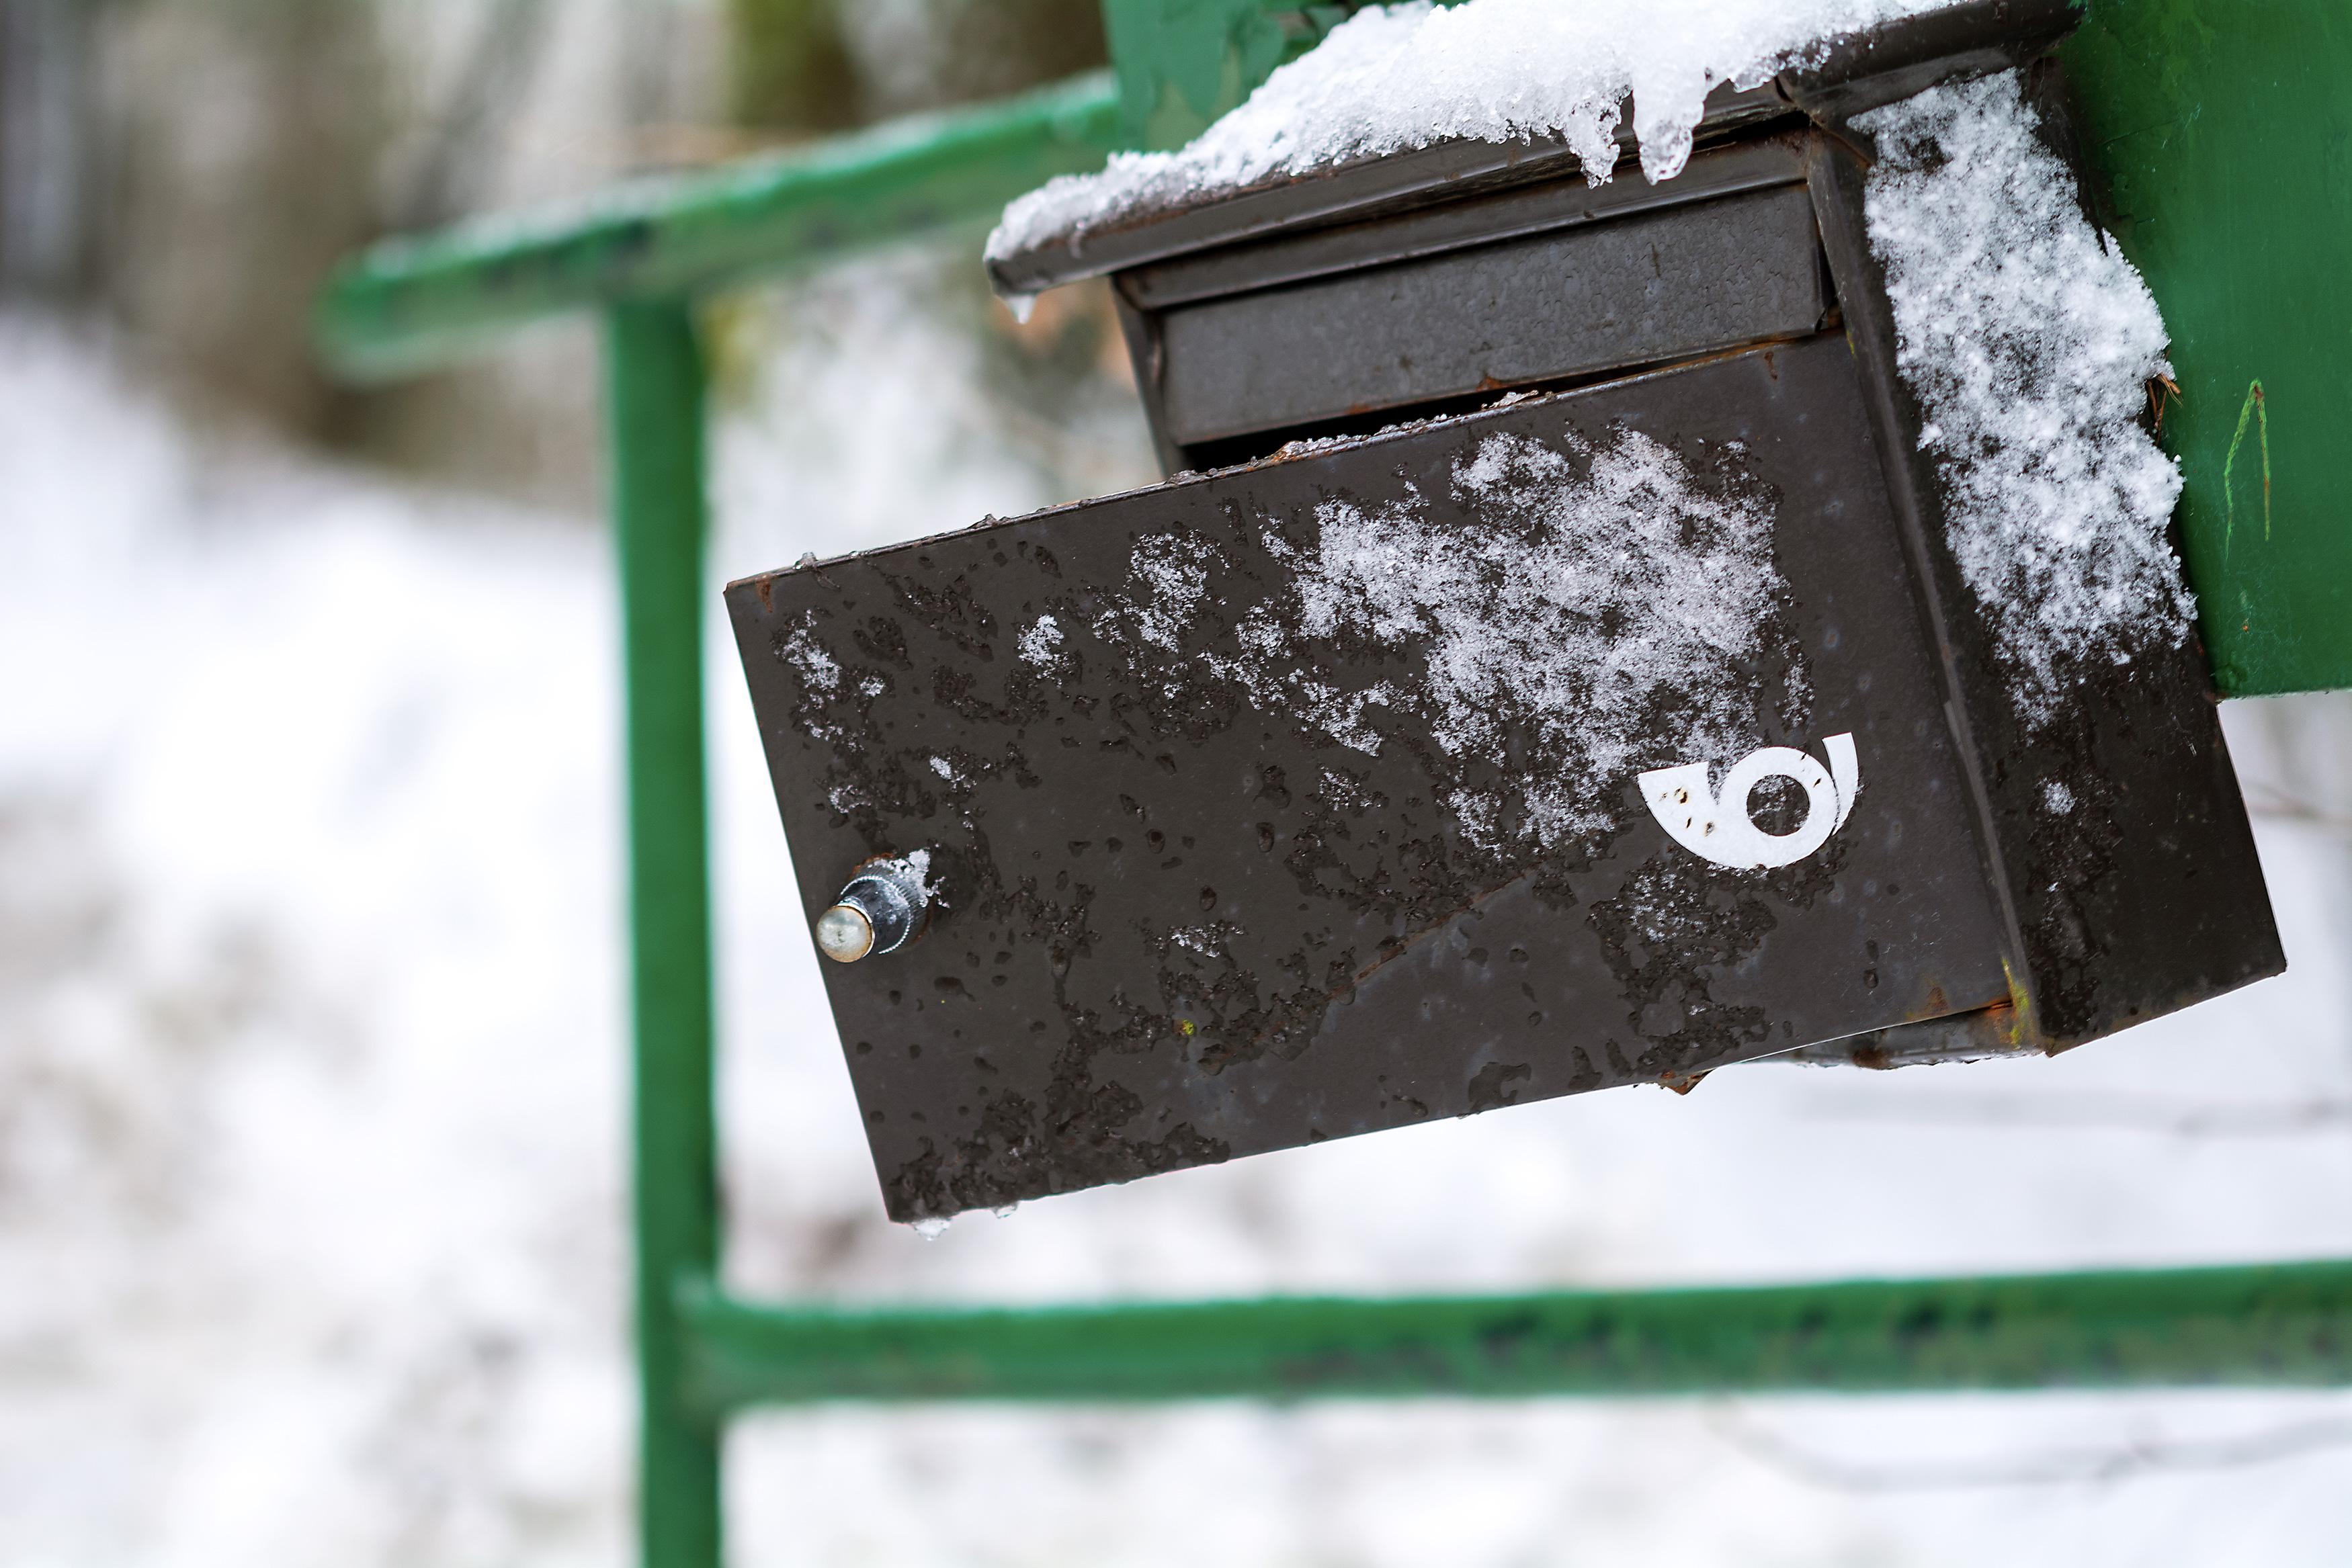 Open Mailbox in Winter | Free Stock Photo | LibreShot